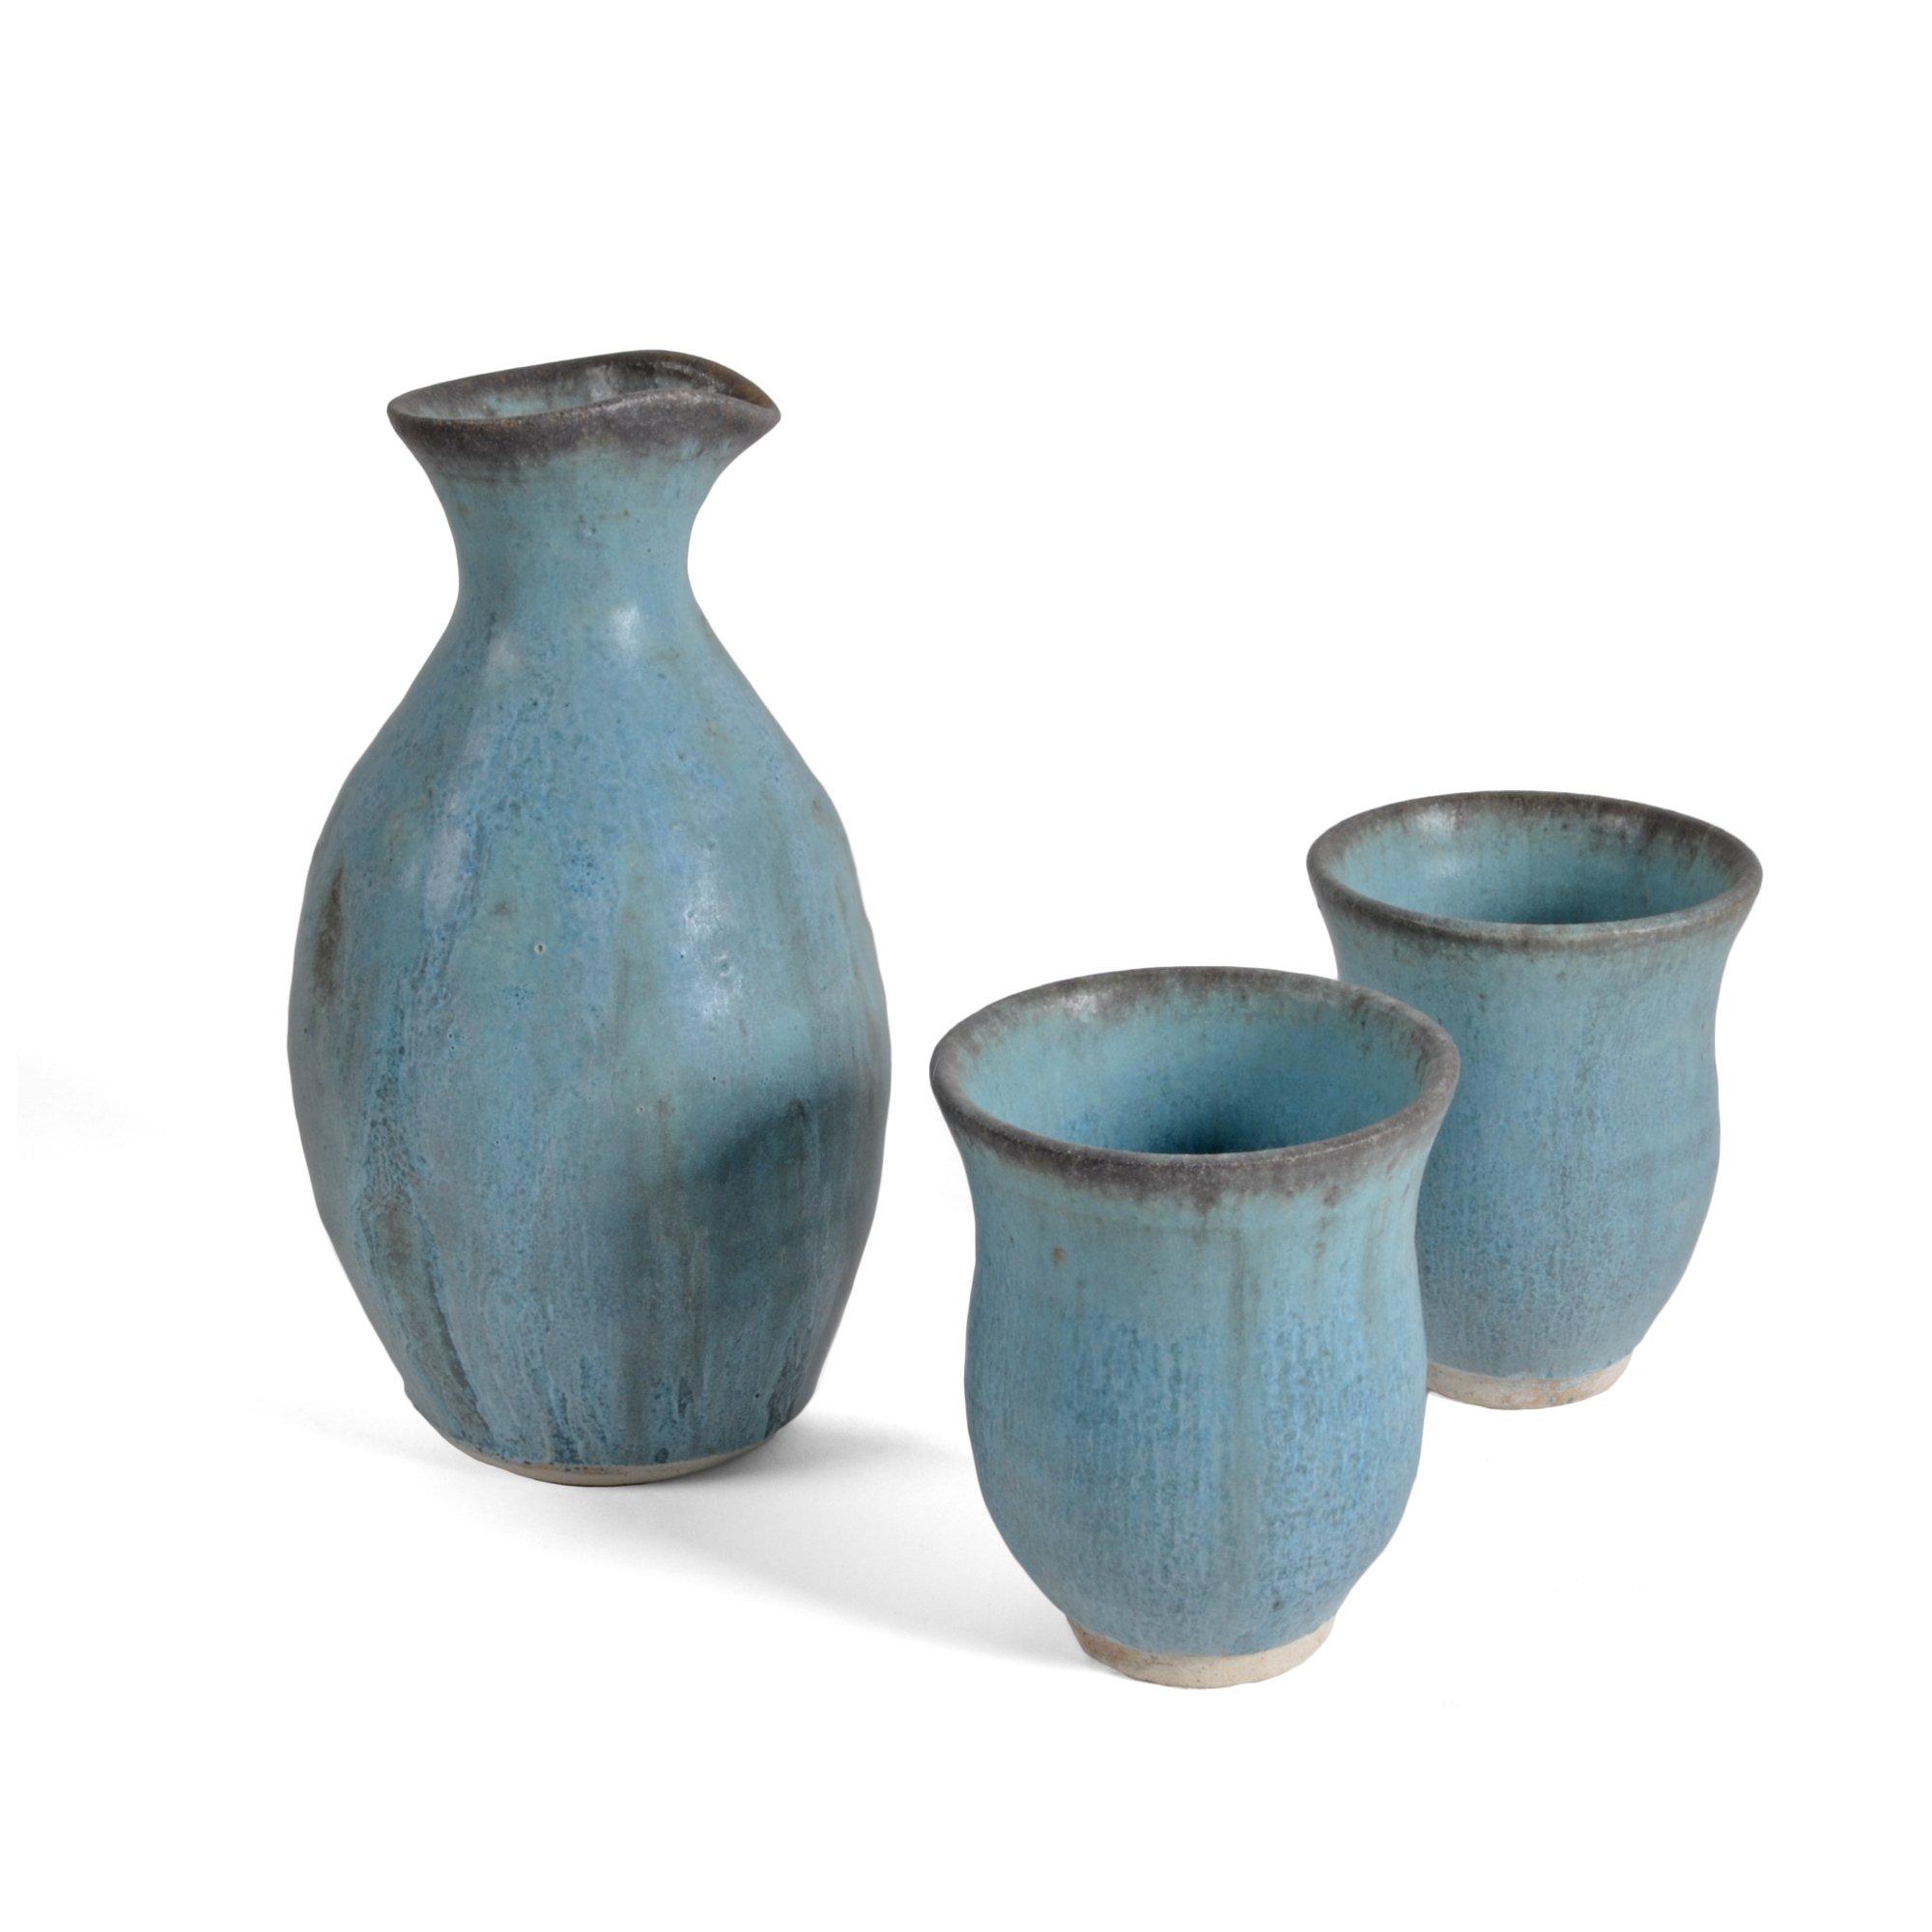 Dock 6 Pottery 3-piece Sake Set, Turquoise by Dock 6 Pottery (Image #1)